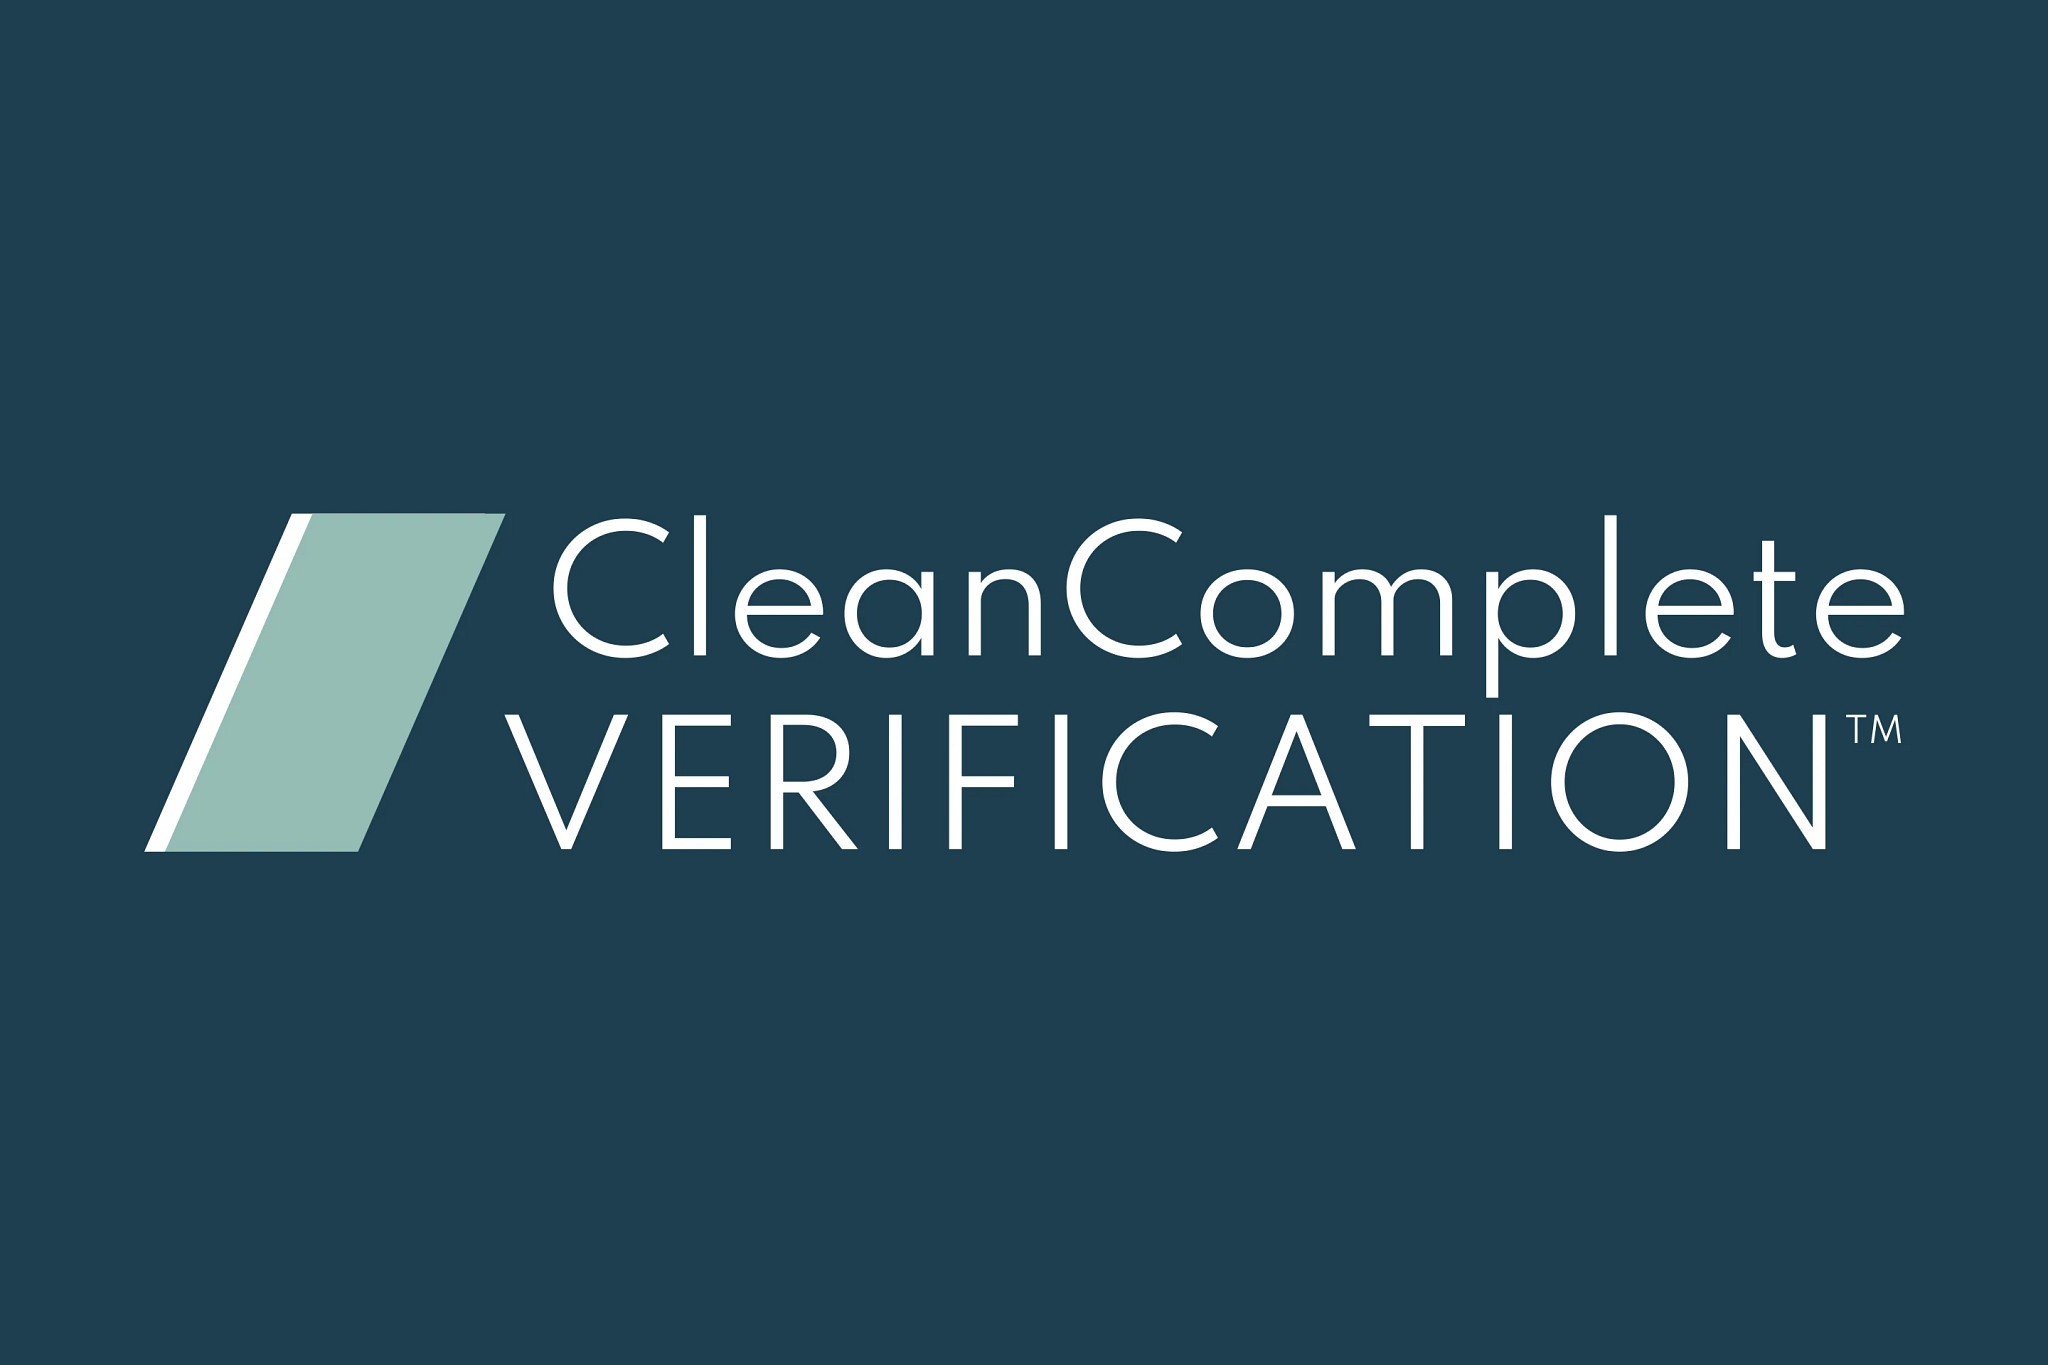 CleanComplete Verification™